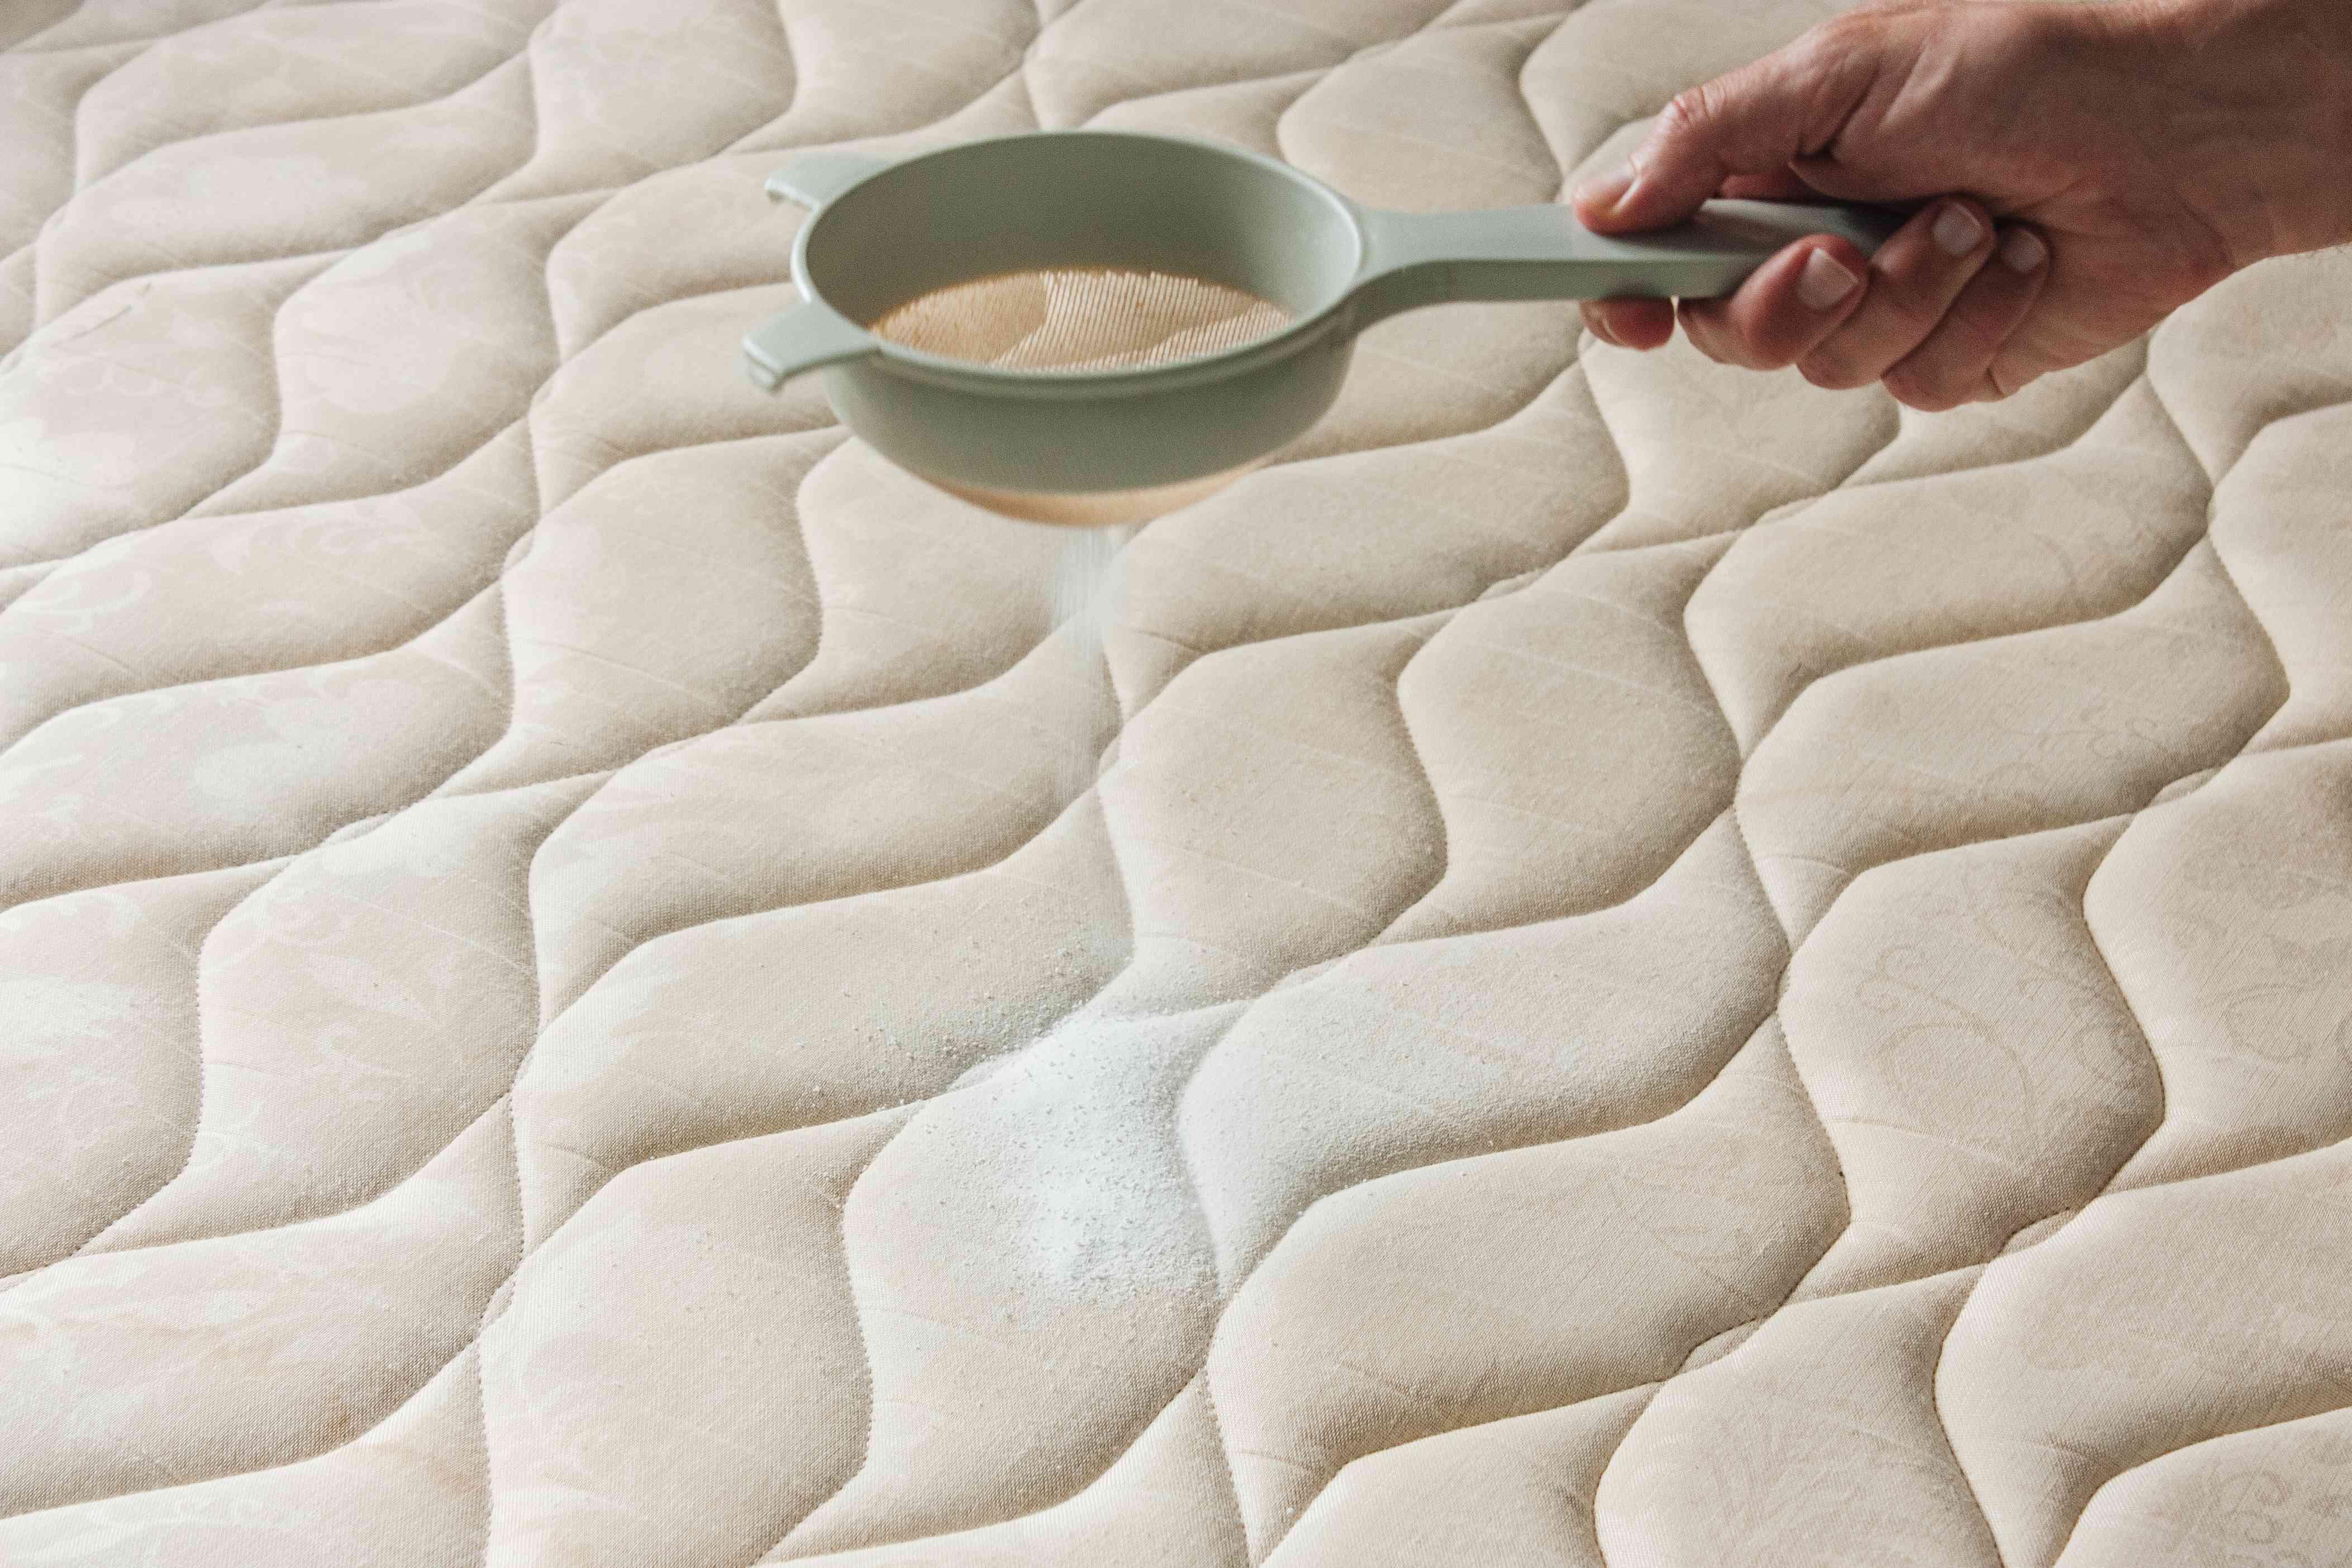 person sprinkling baking soda onto a mattress